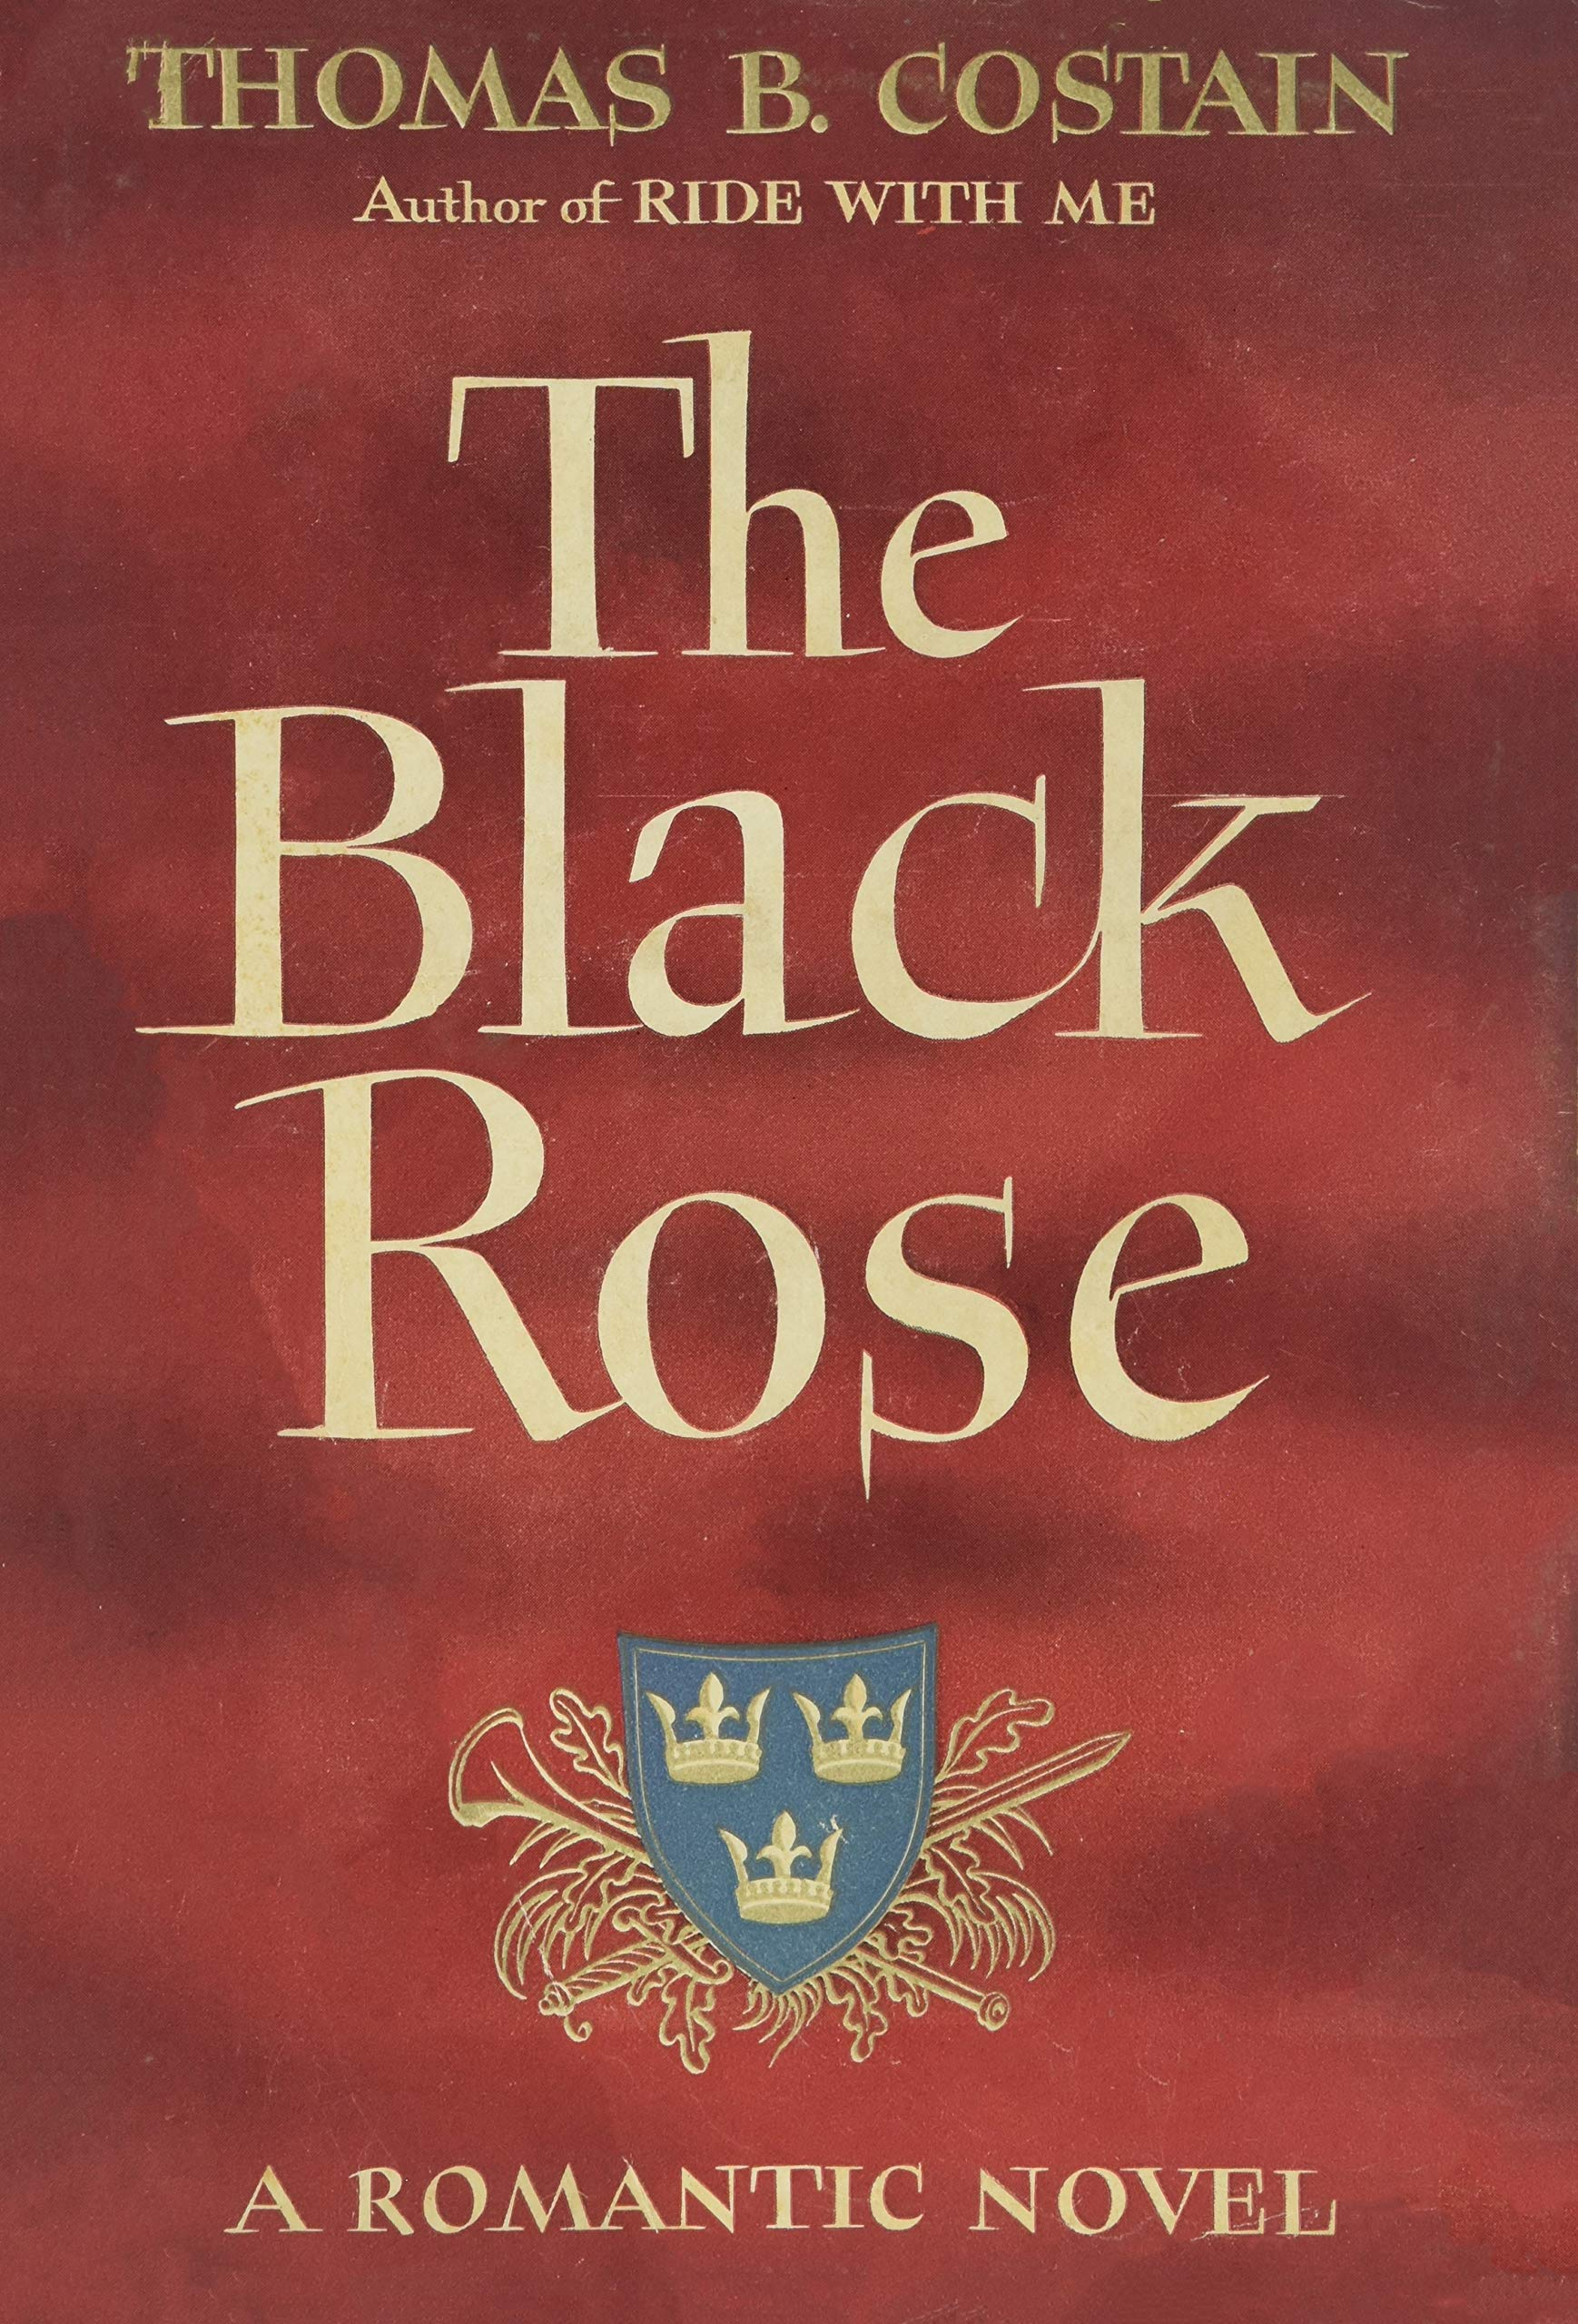 The Black Rose, 1945: Thomas B. Costain: Amazon.com: Books